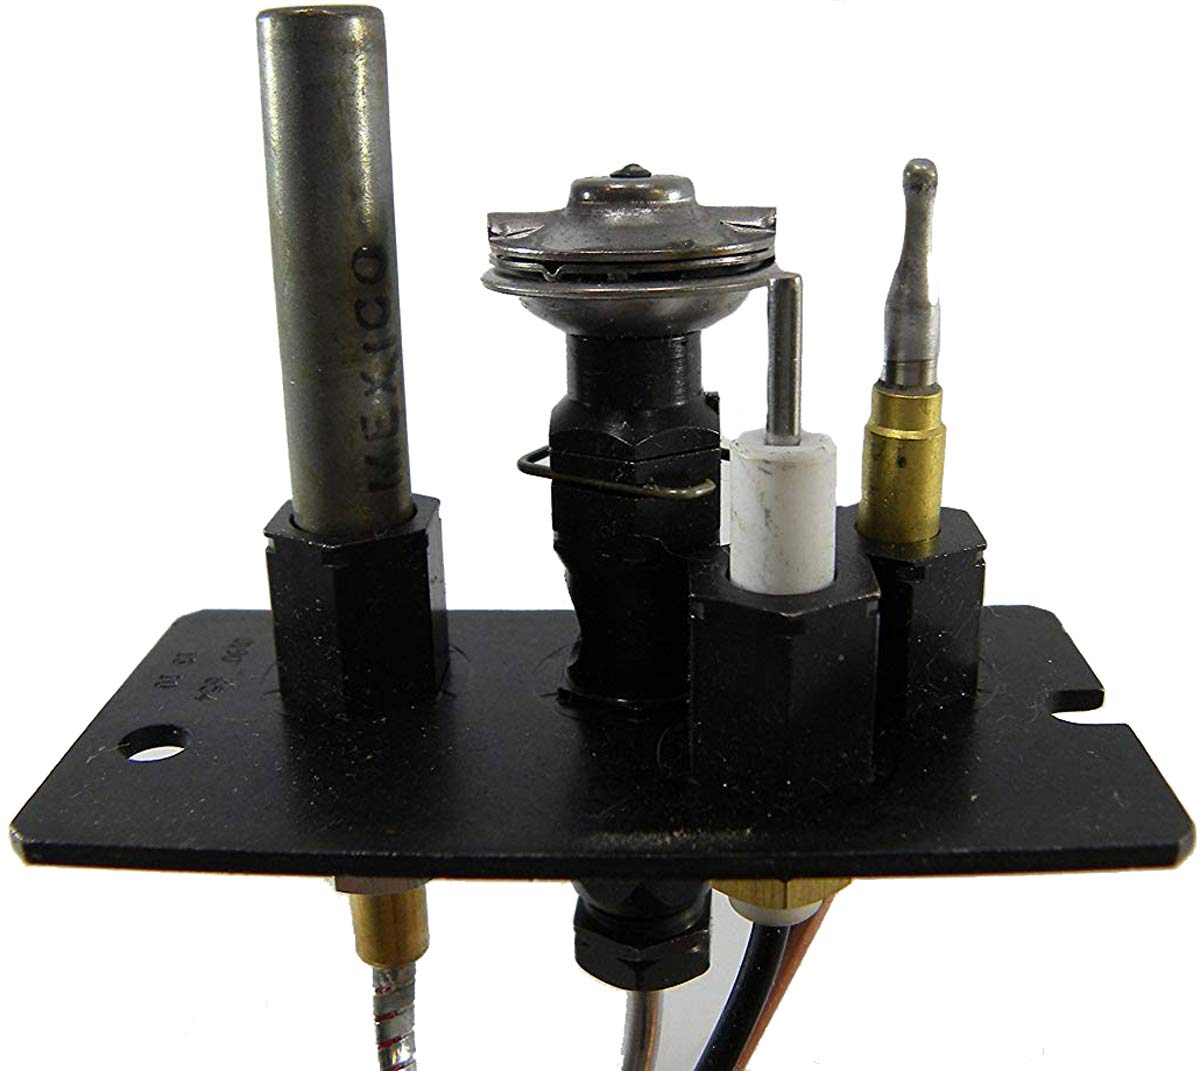 Heatilator Sit Top Mount Fireplace Pilot Assembly Natural Gas by Heatilator